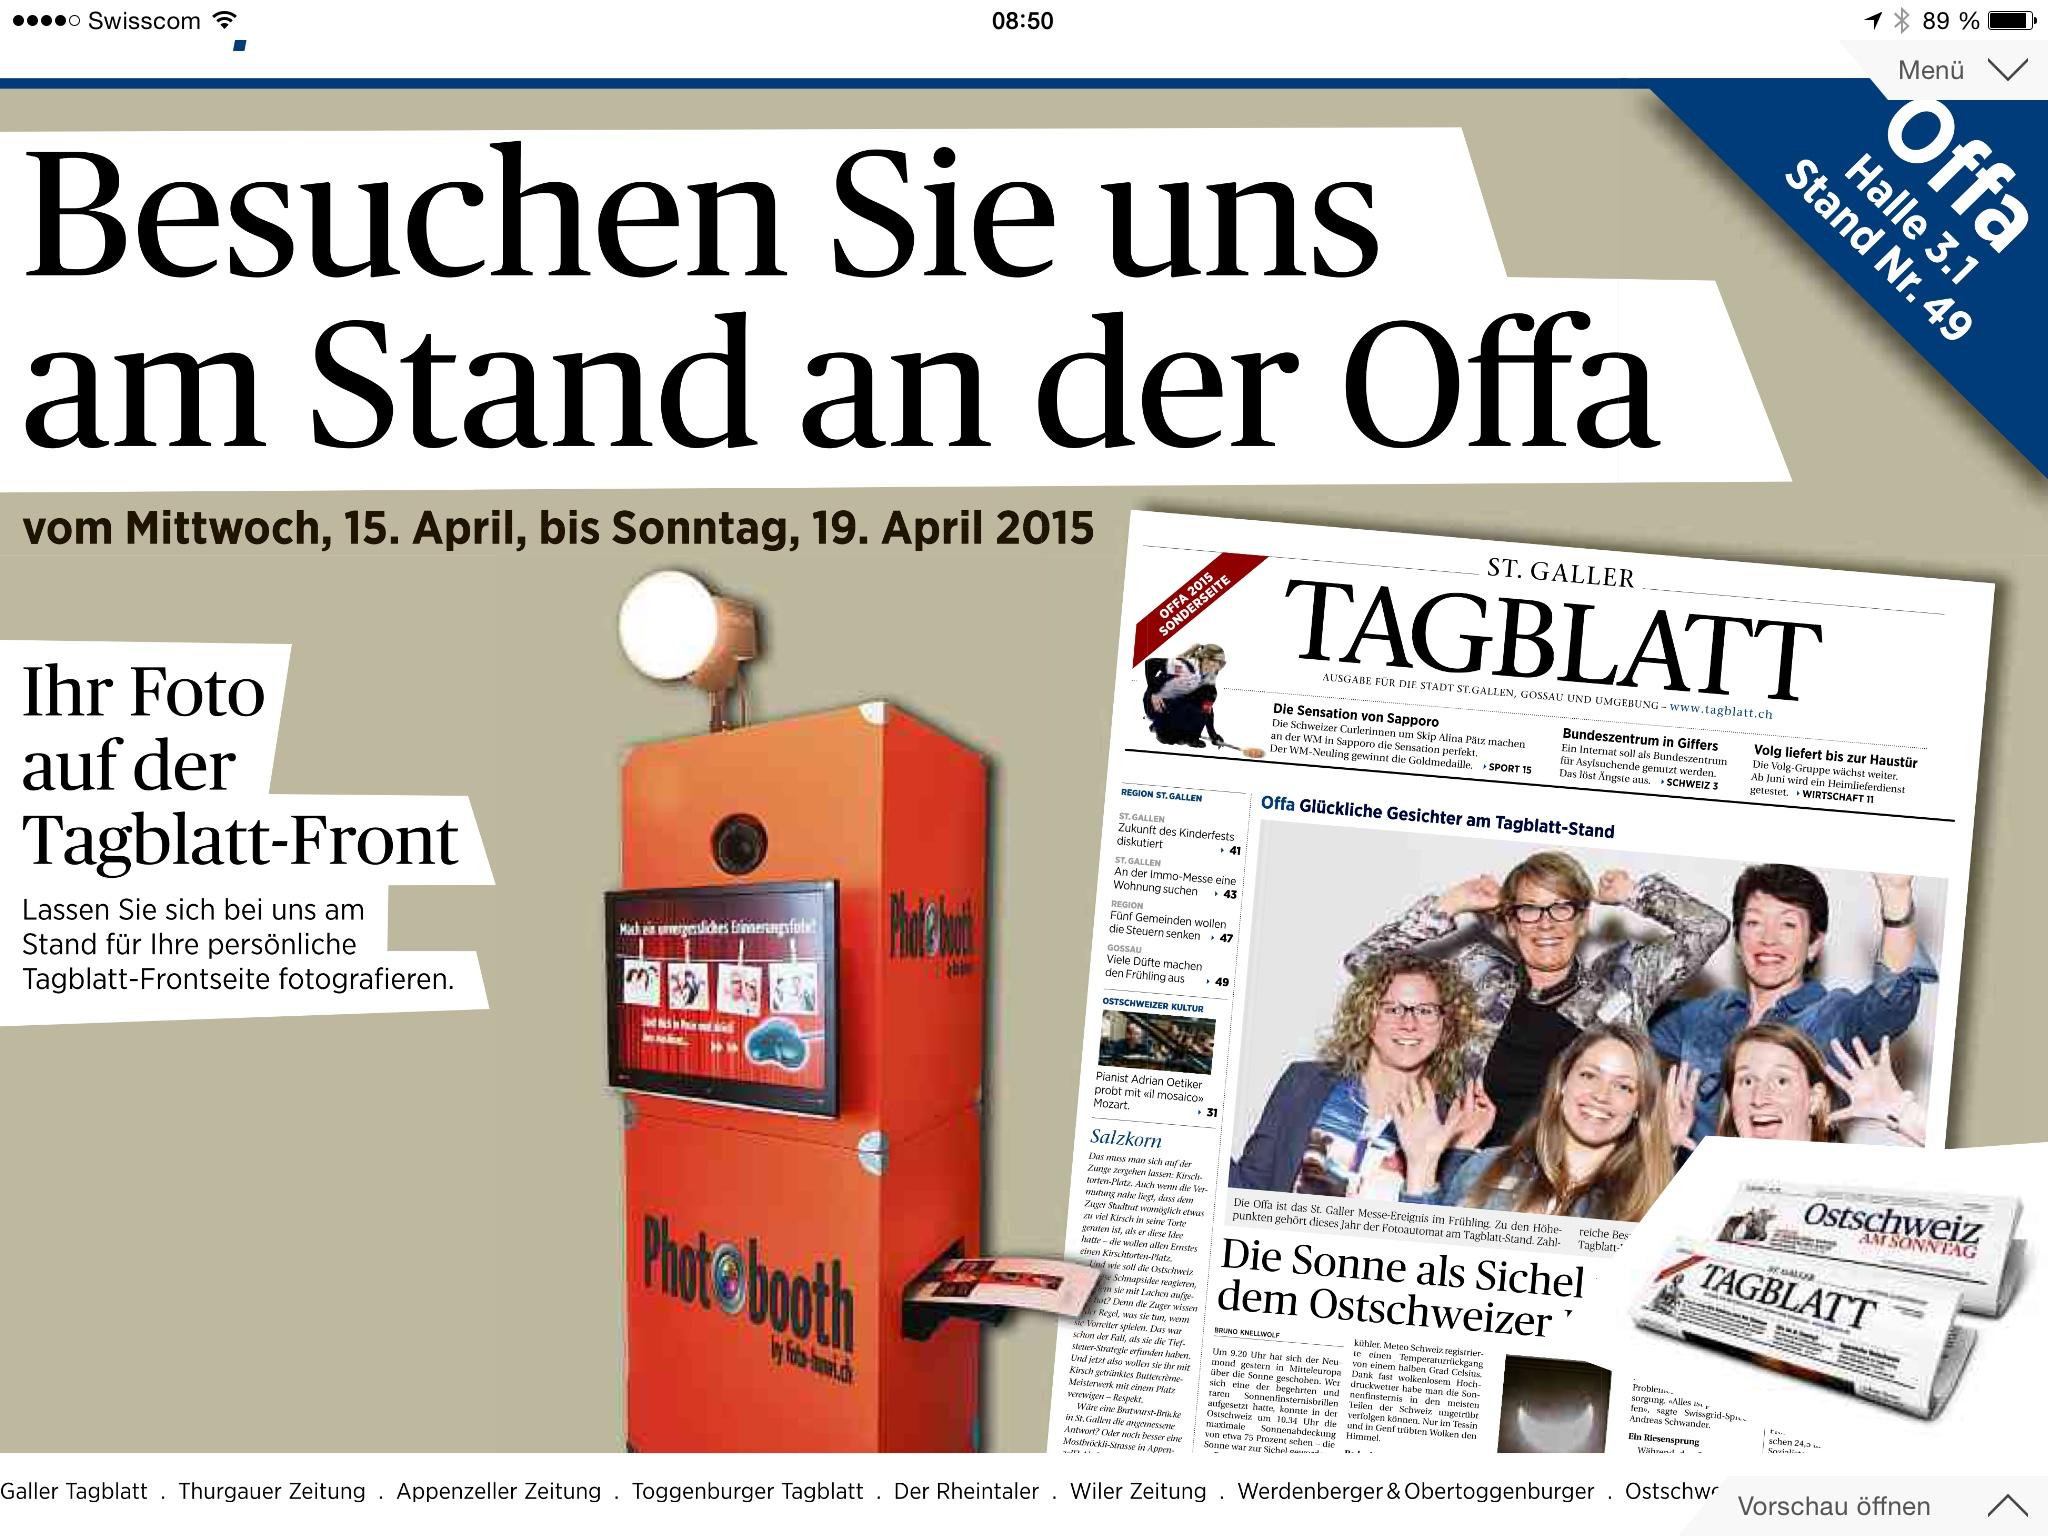 Tagblatt-Photobooth an der OFFA  2015 / Halle 3.1 / Stand 49